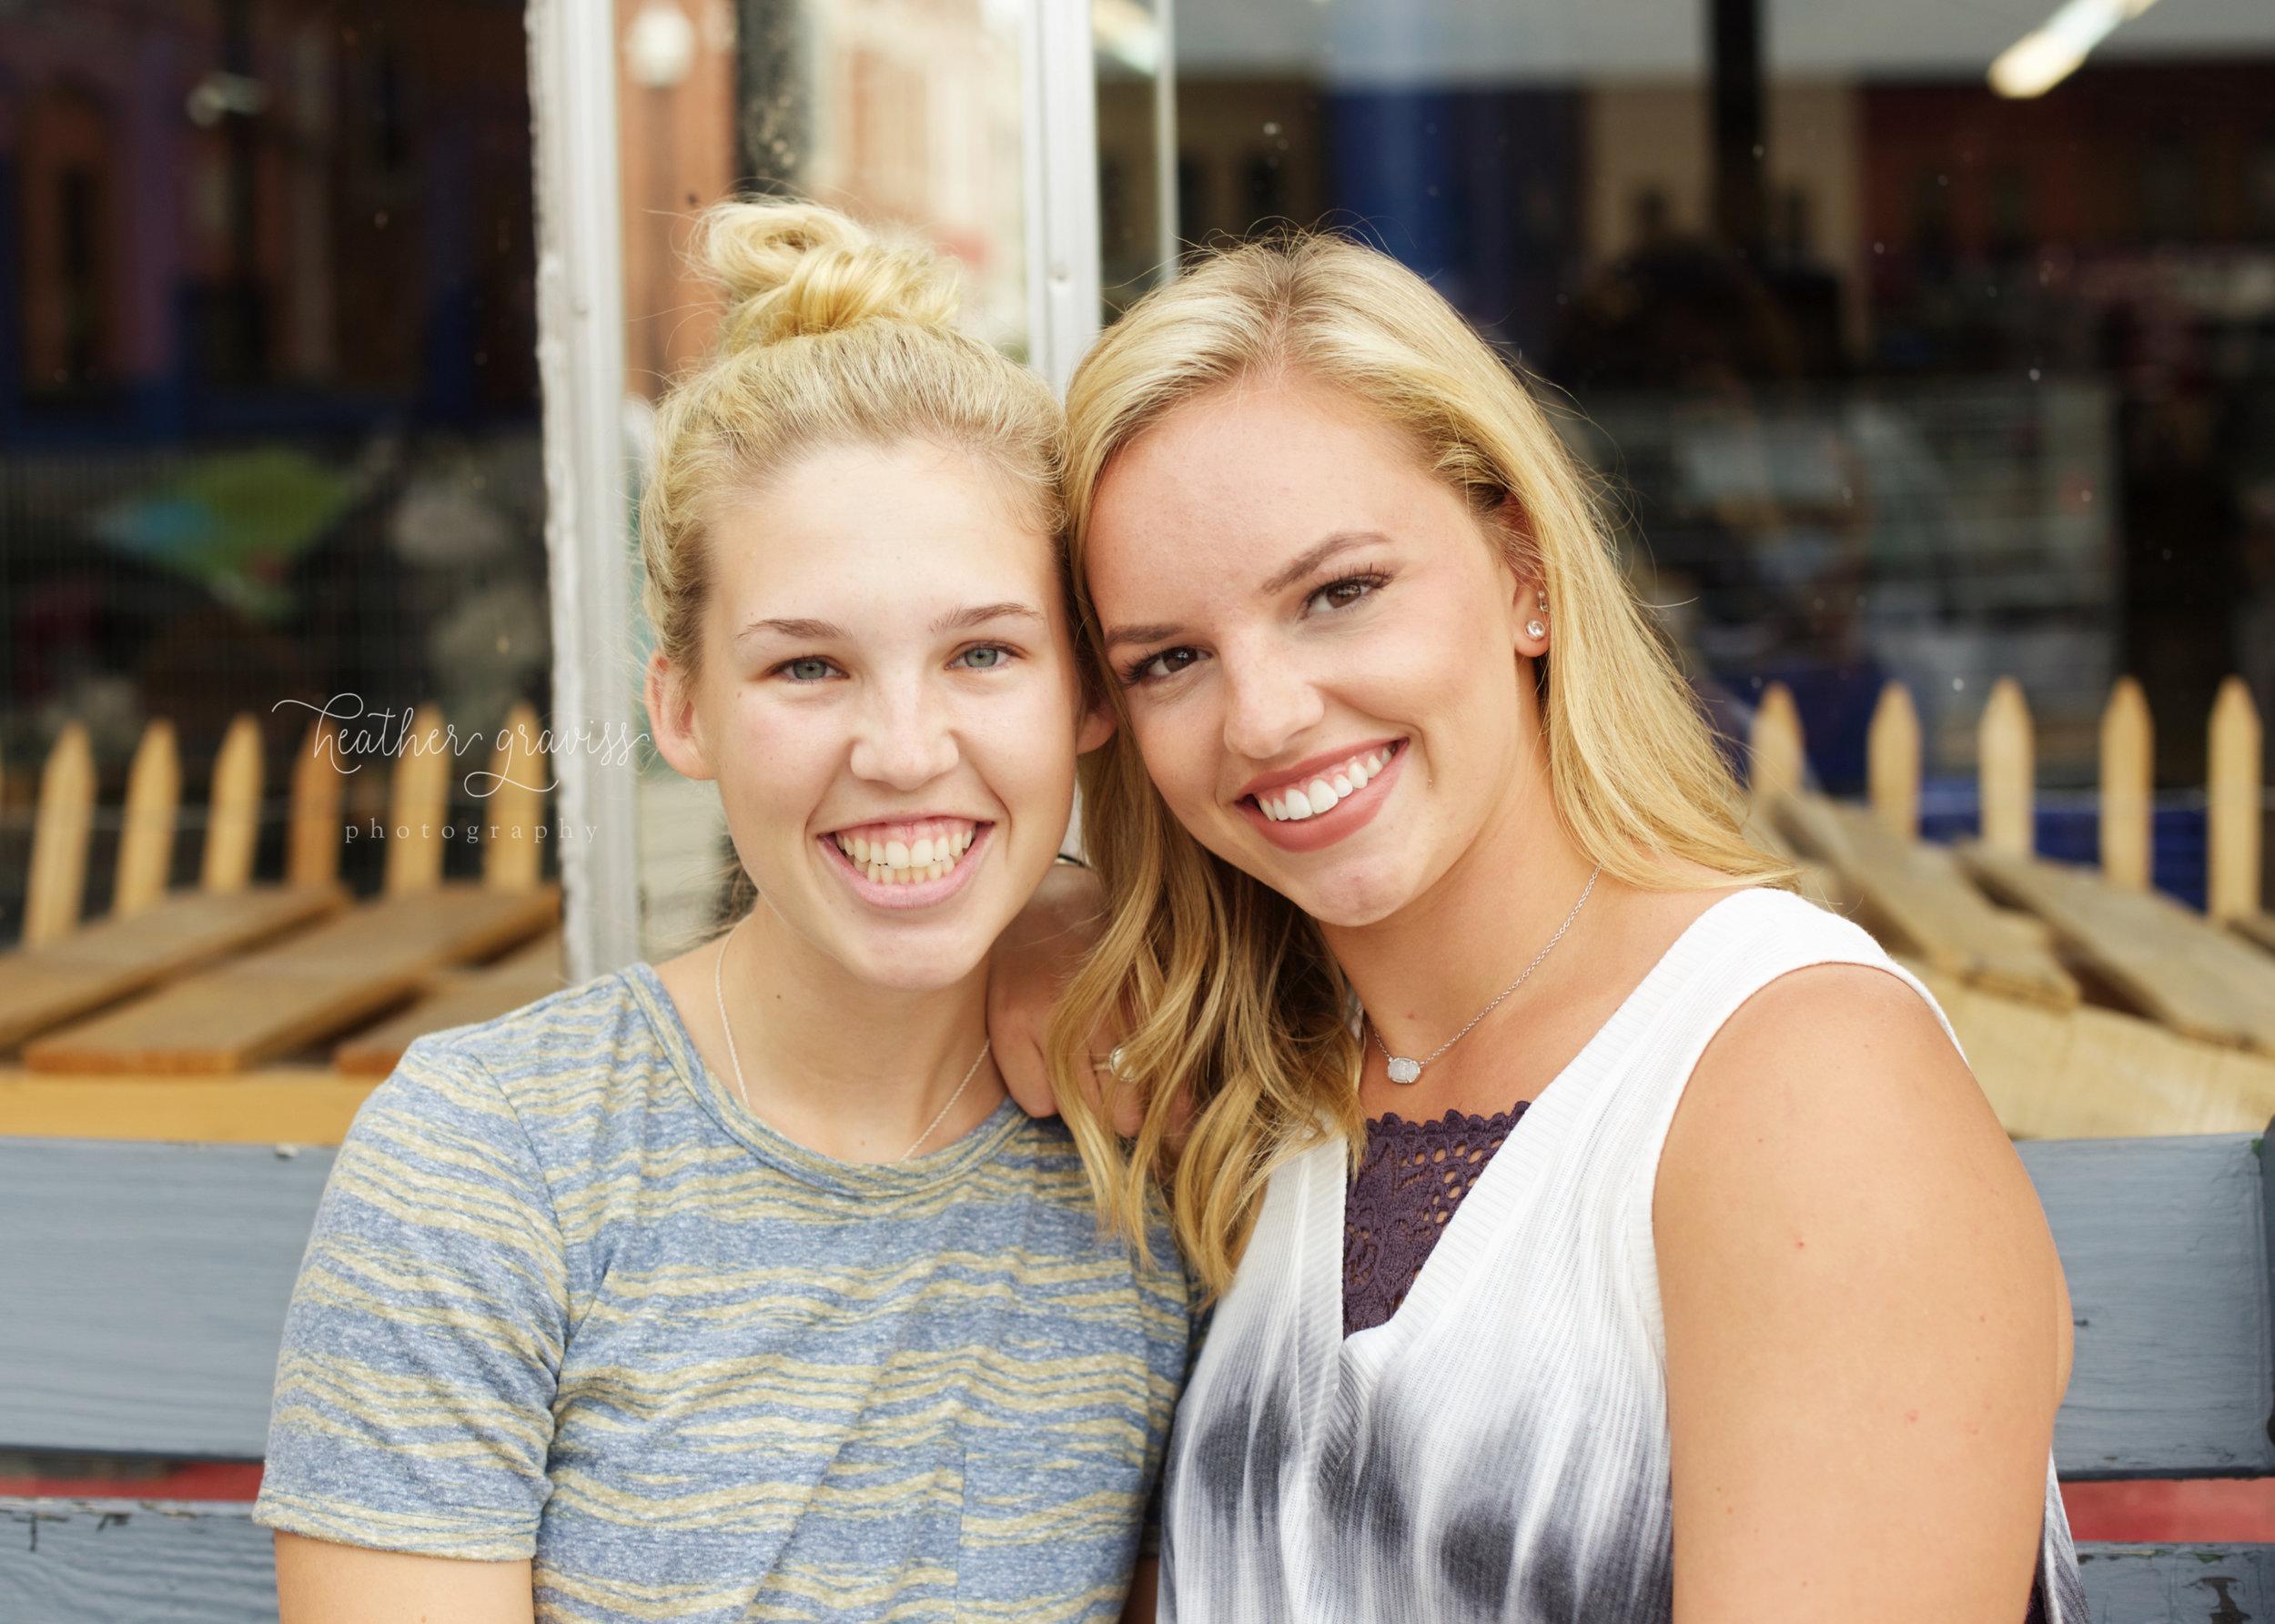 senior girl with friend